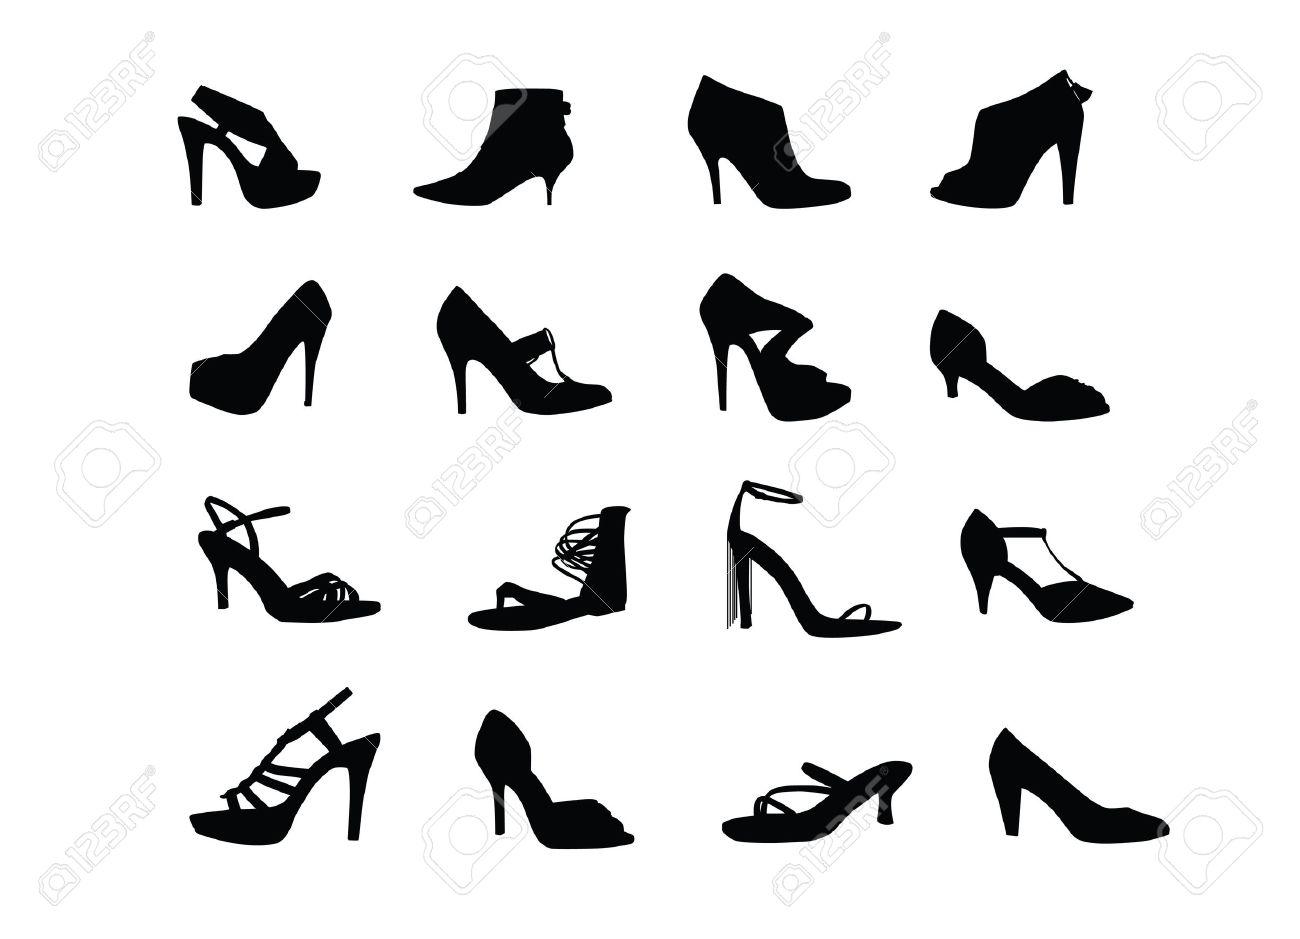 Women heel shoes silhouettes - 14580518